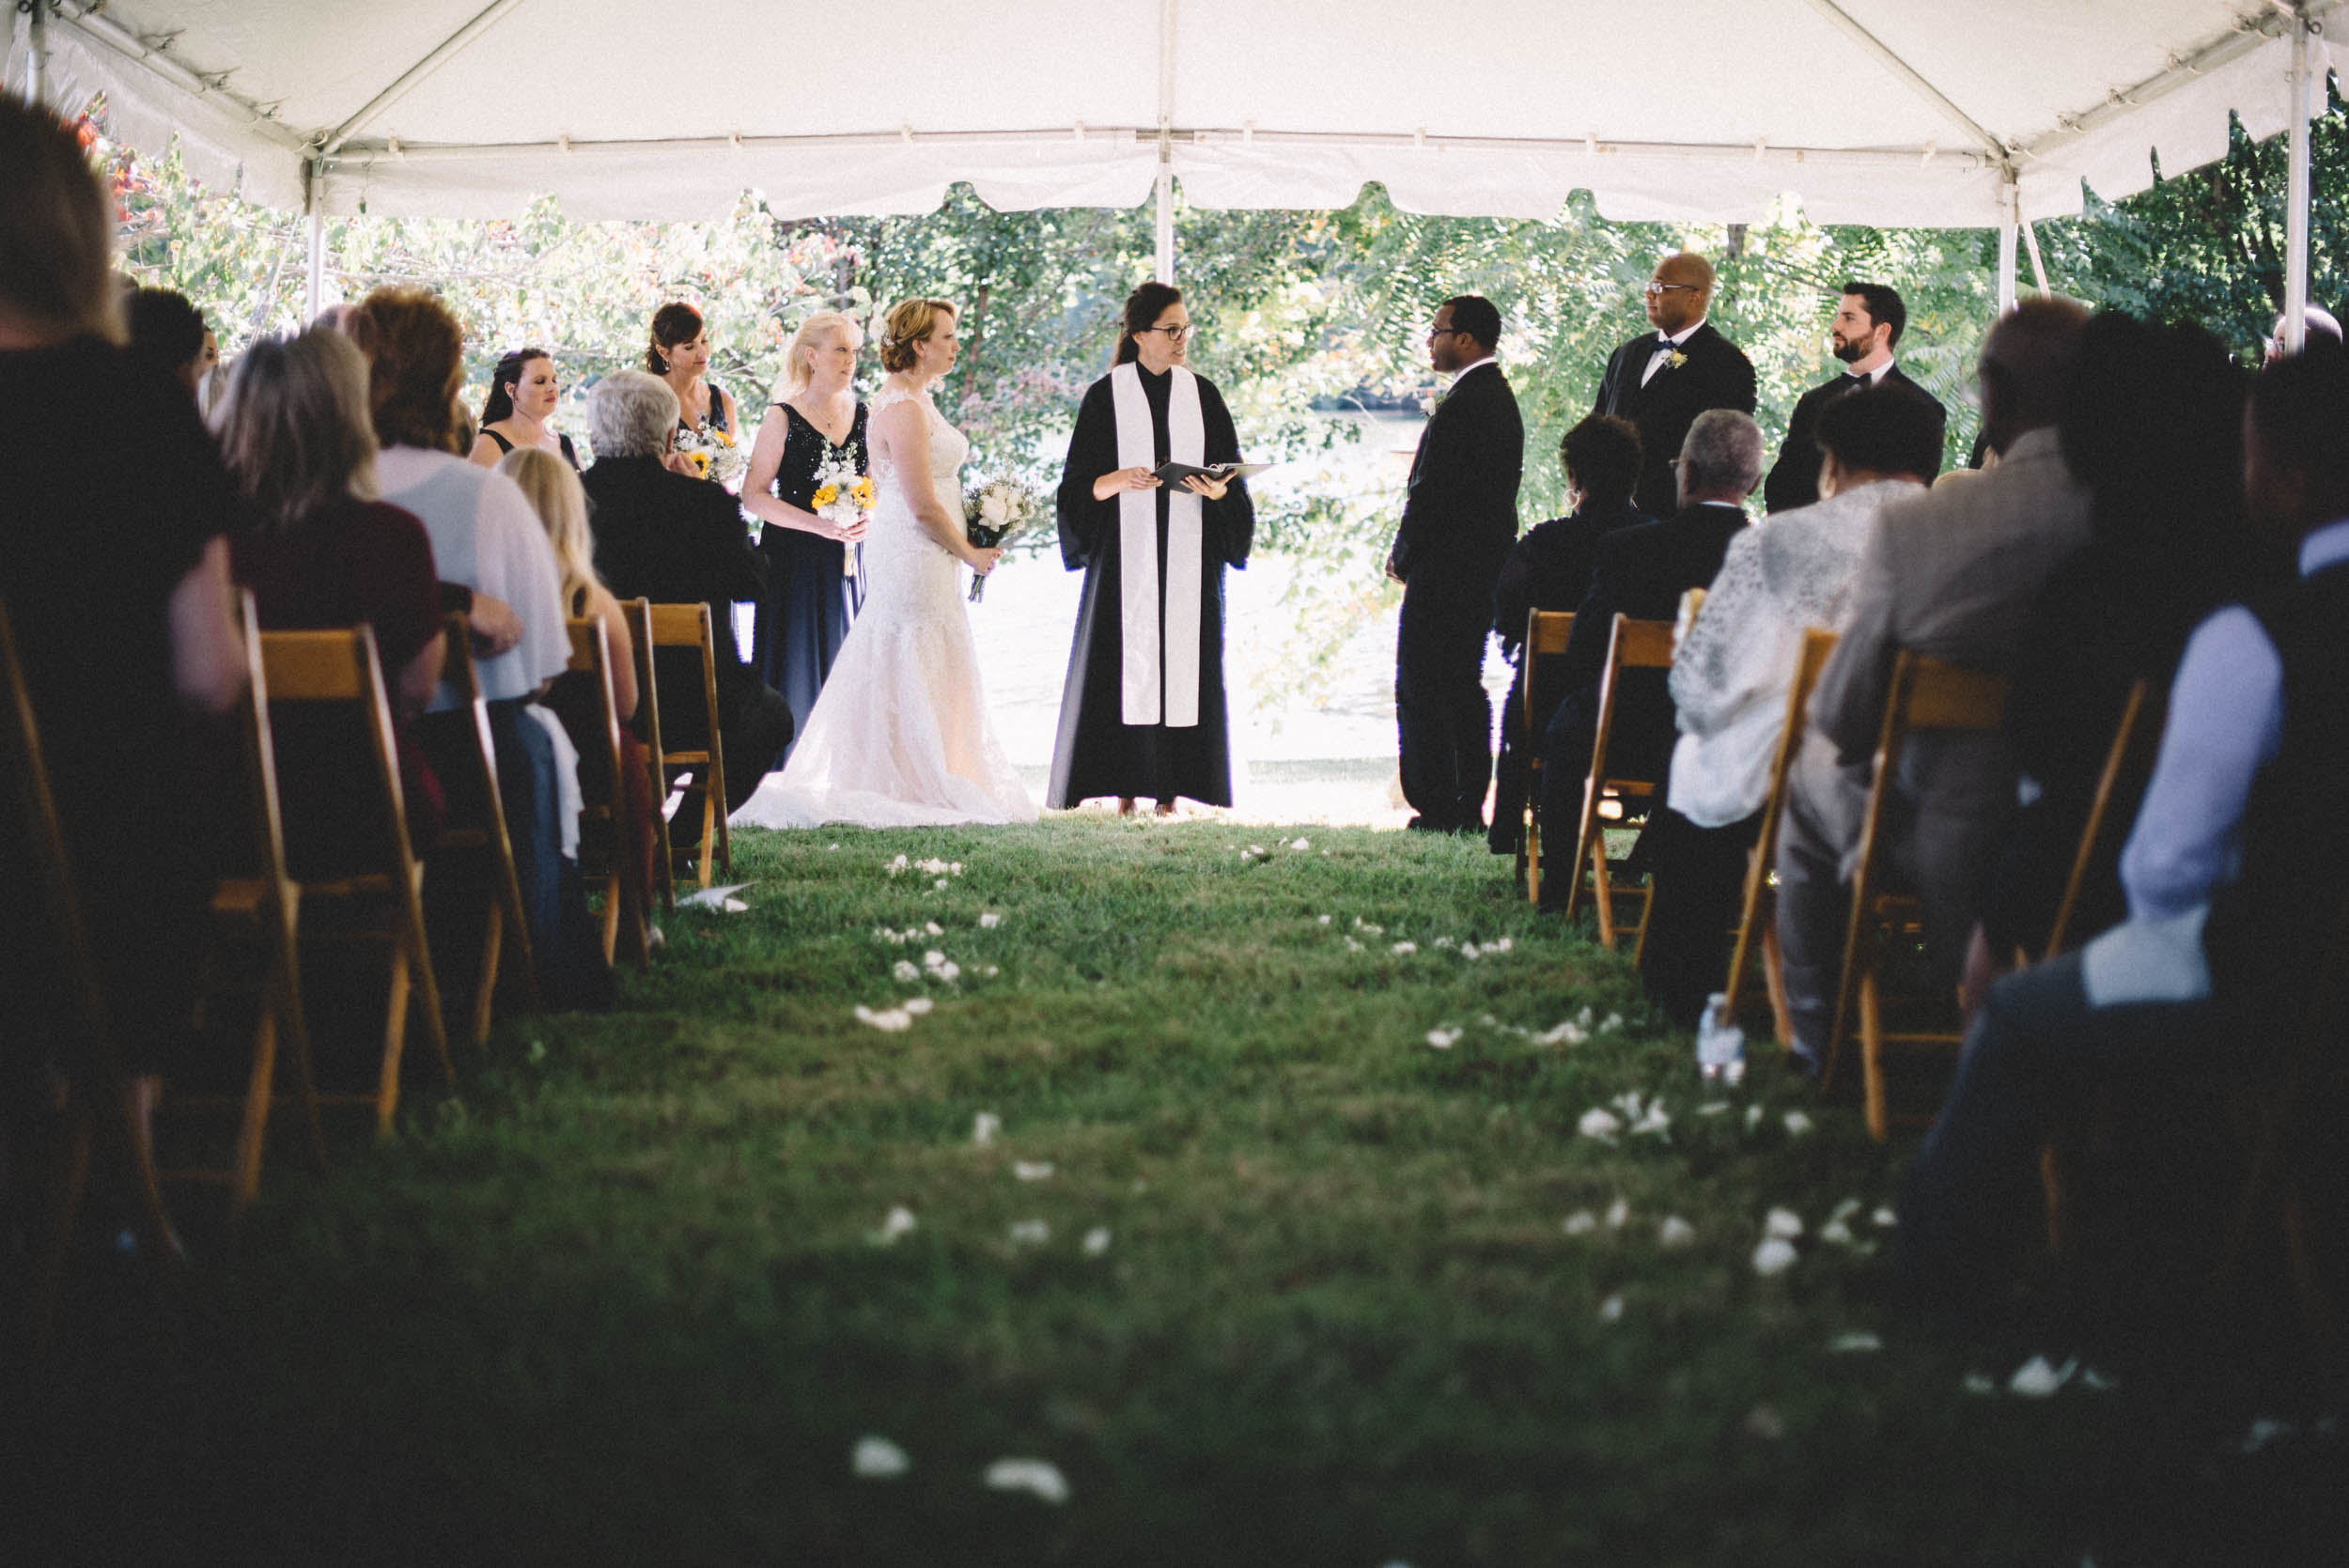 Gaie-Lea-Staunton-weddding-photographer-50.jpg